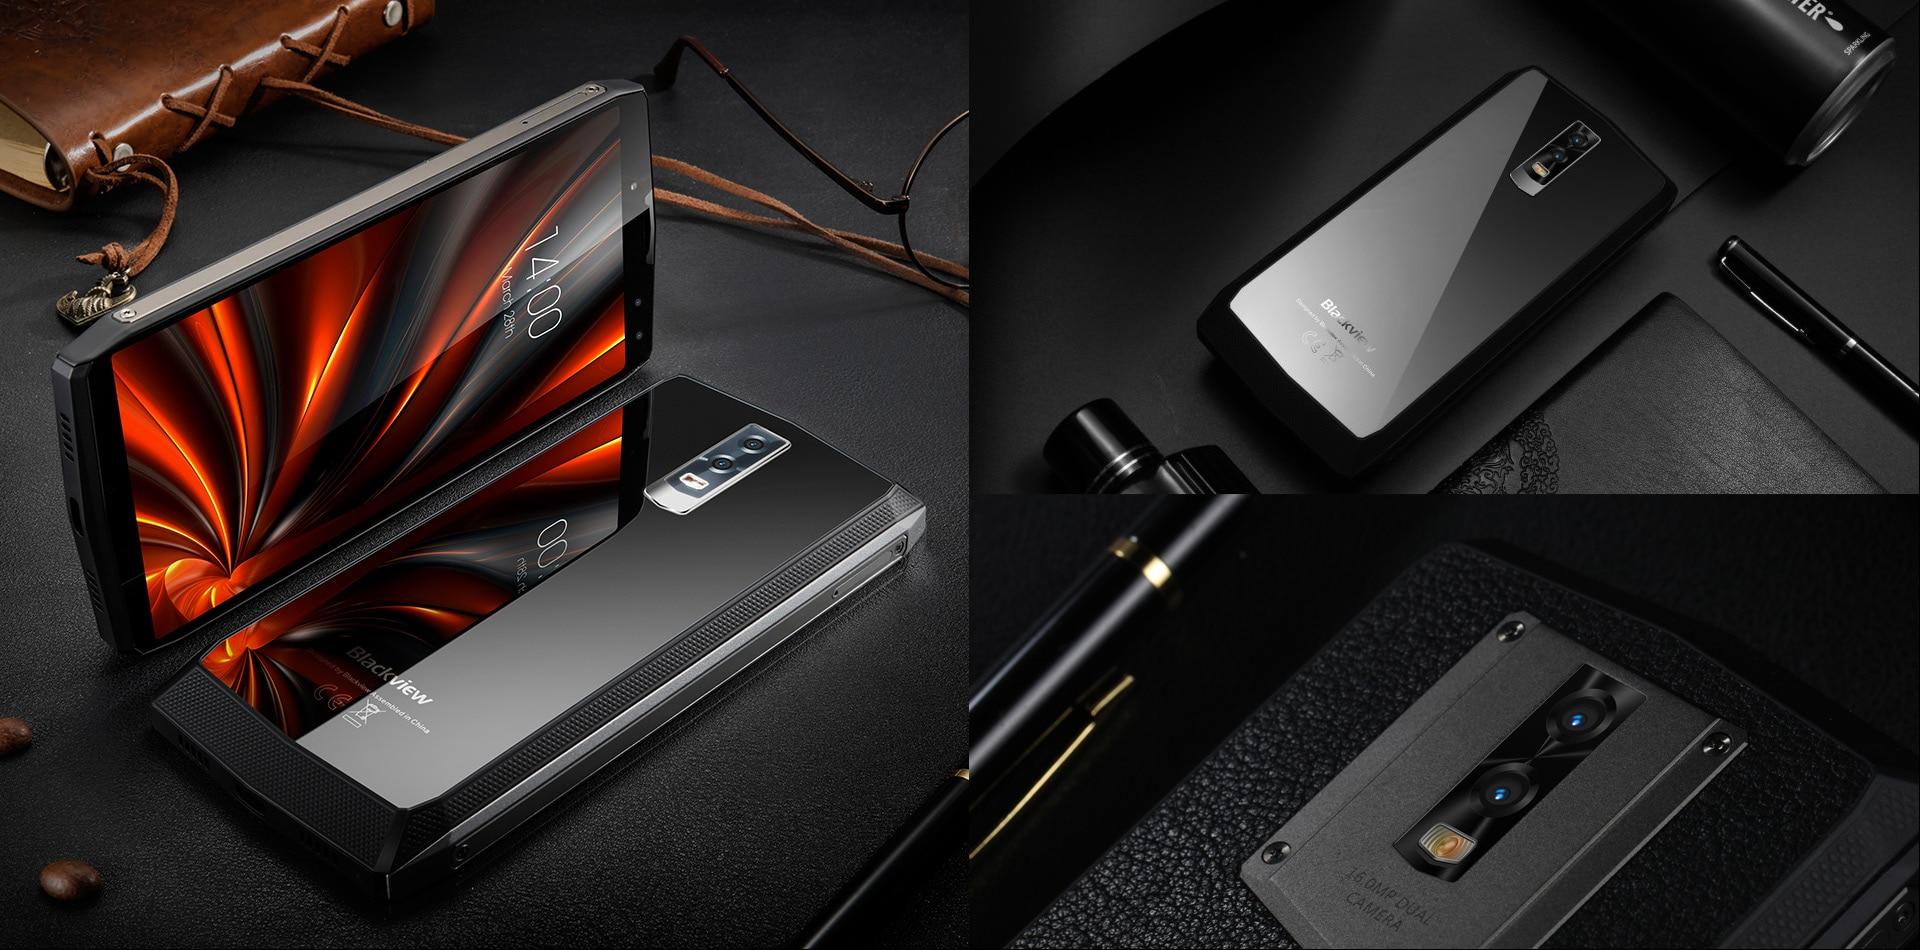 Blackview P10000 Pro 5.99 Inch FHD+ Full Screen 4GB RAM + 64GB ROM MT6763 Octa Core Smartphone Glass Black - 8